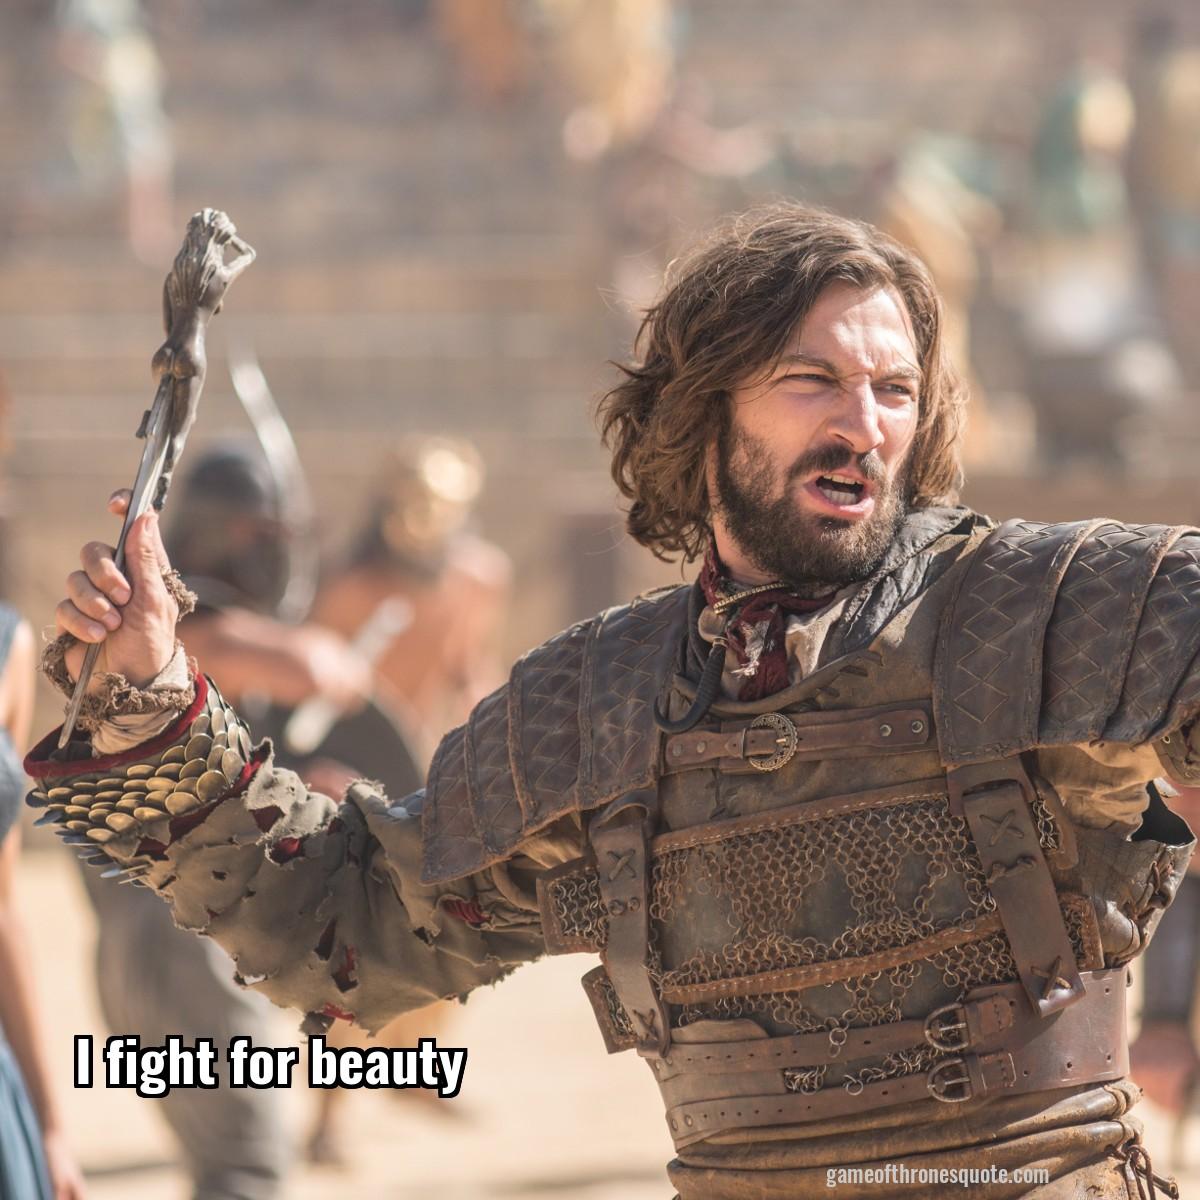 Daario Naharis: I fight for beauty | Game of Thrones Quote Daario Naharis Arakh